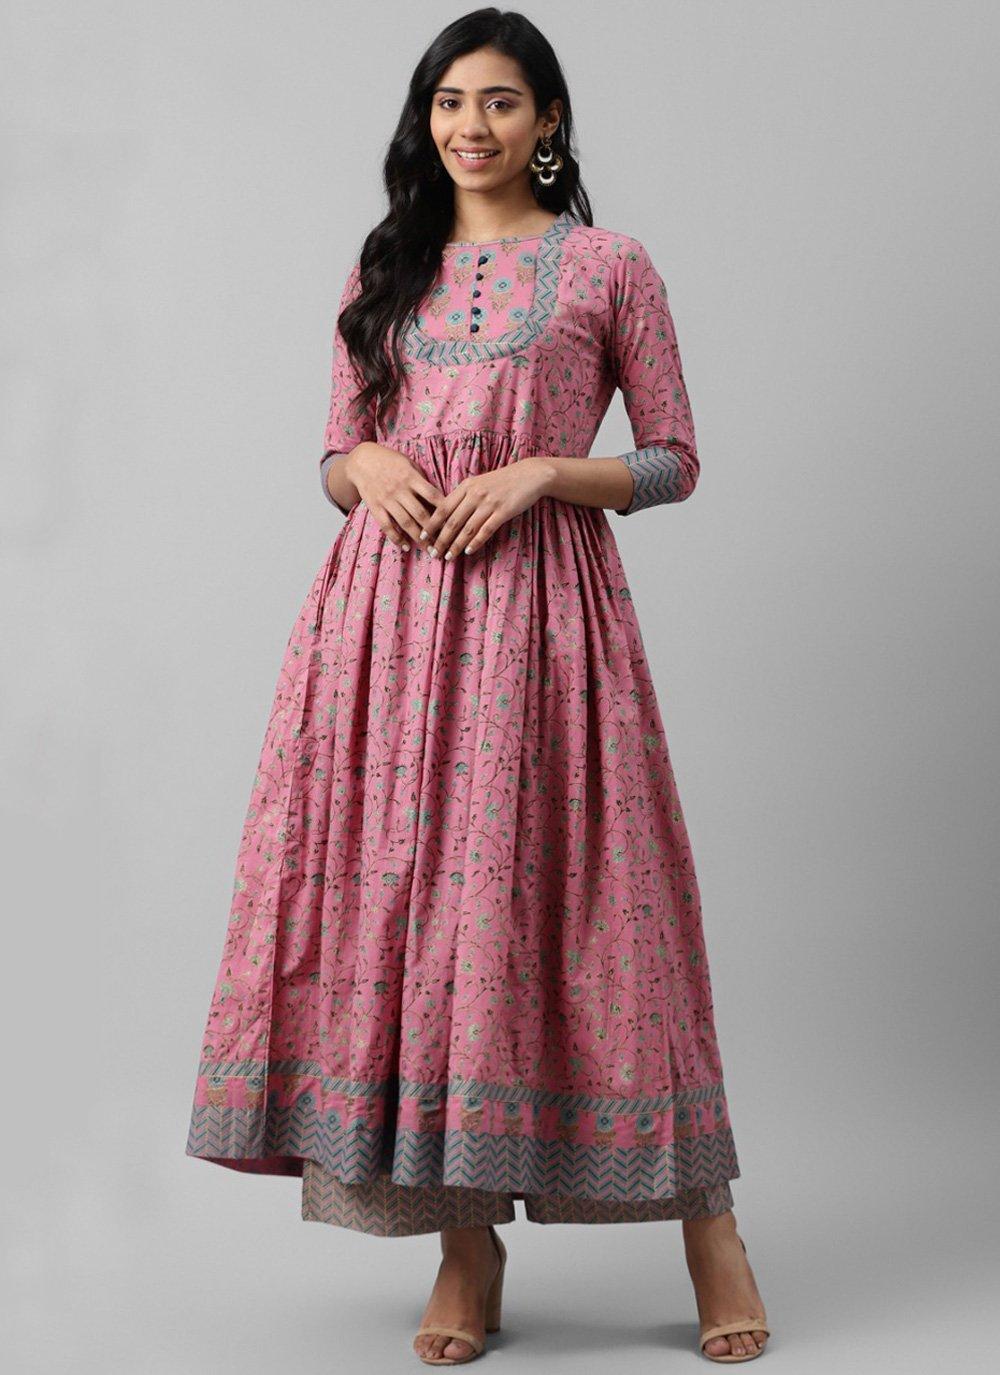 Cotton Bollywood Salwar Kameez in Pink